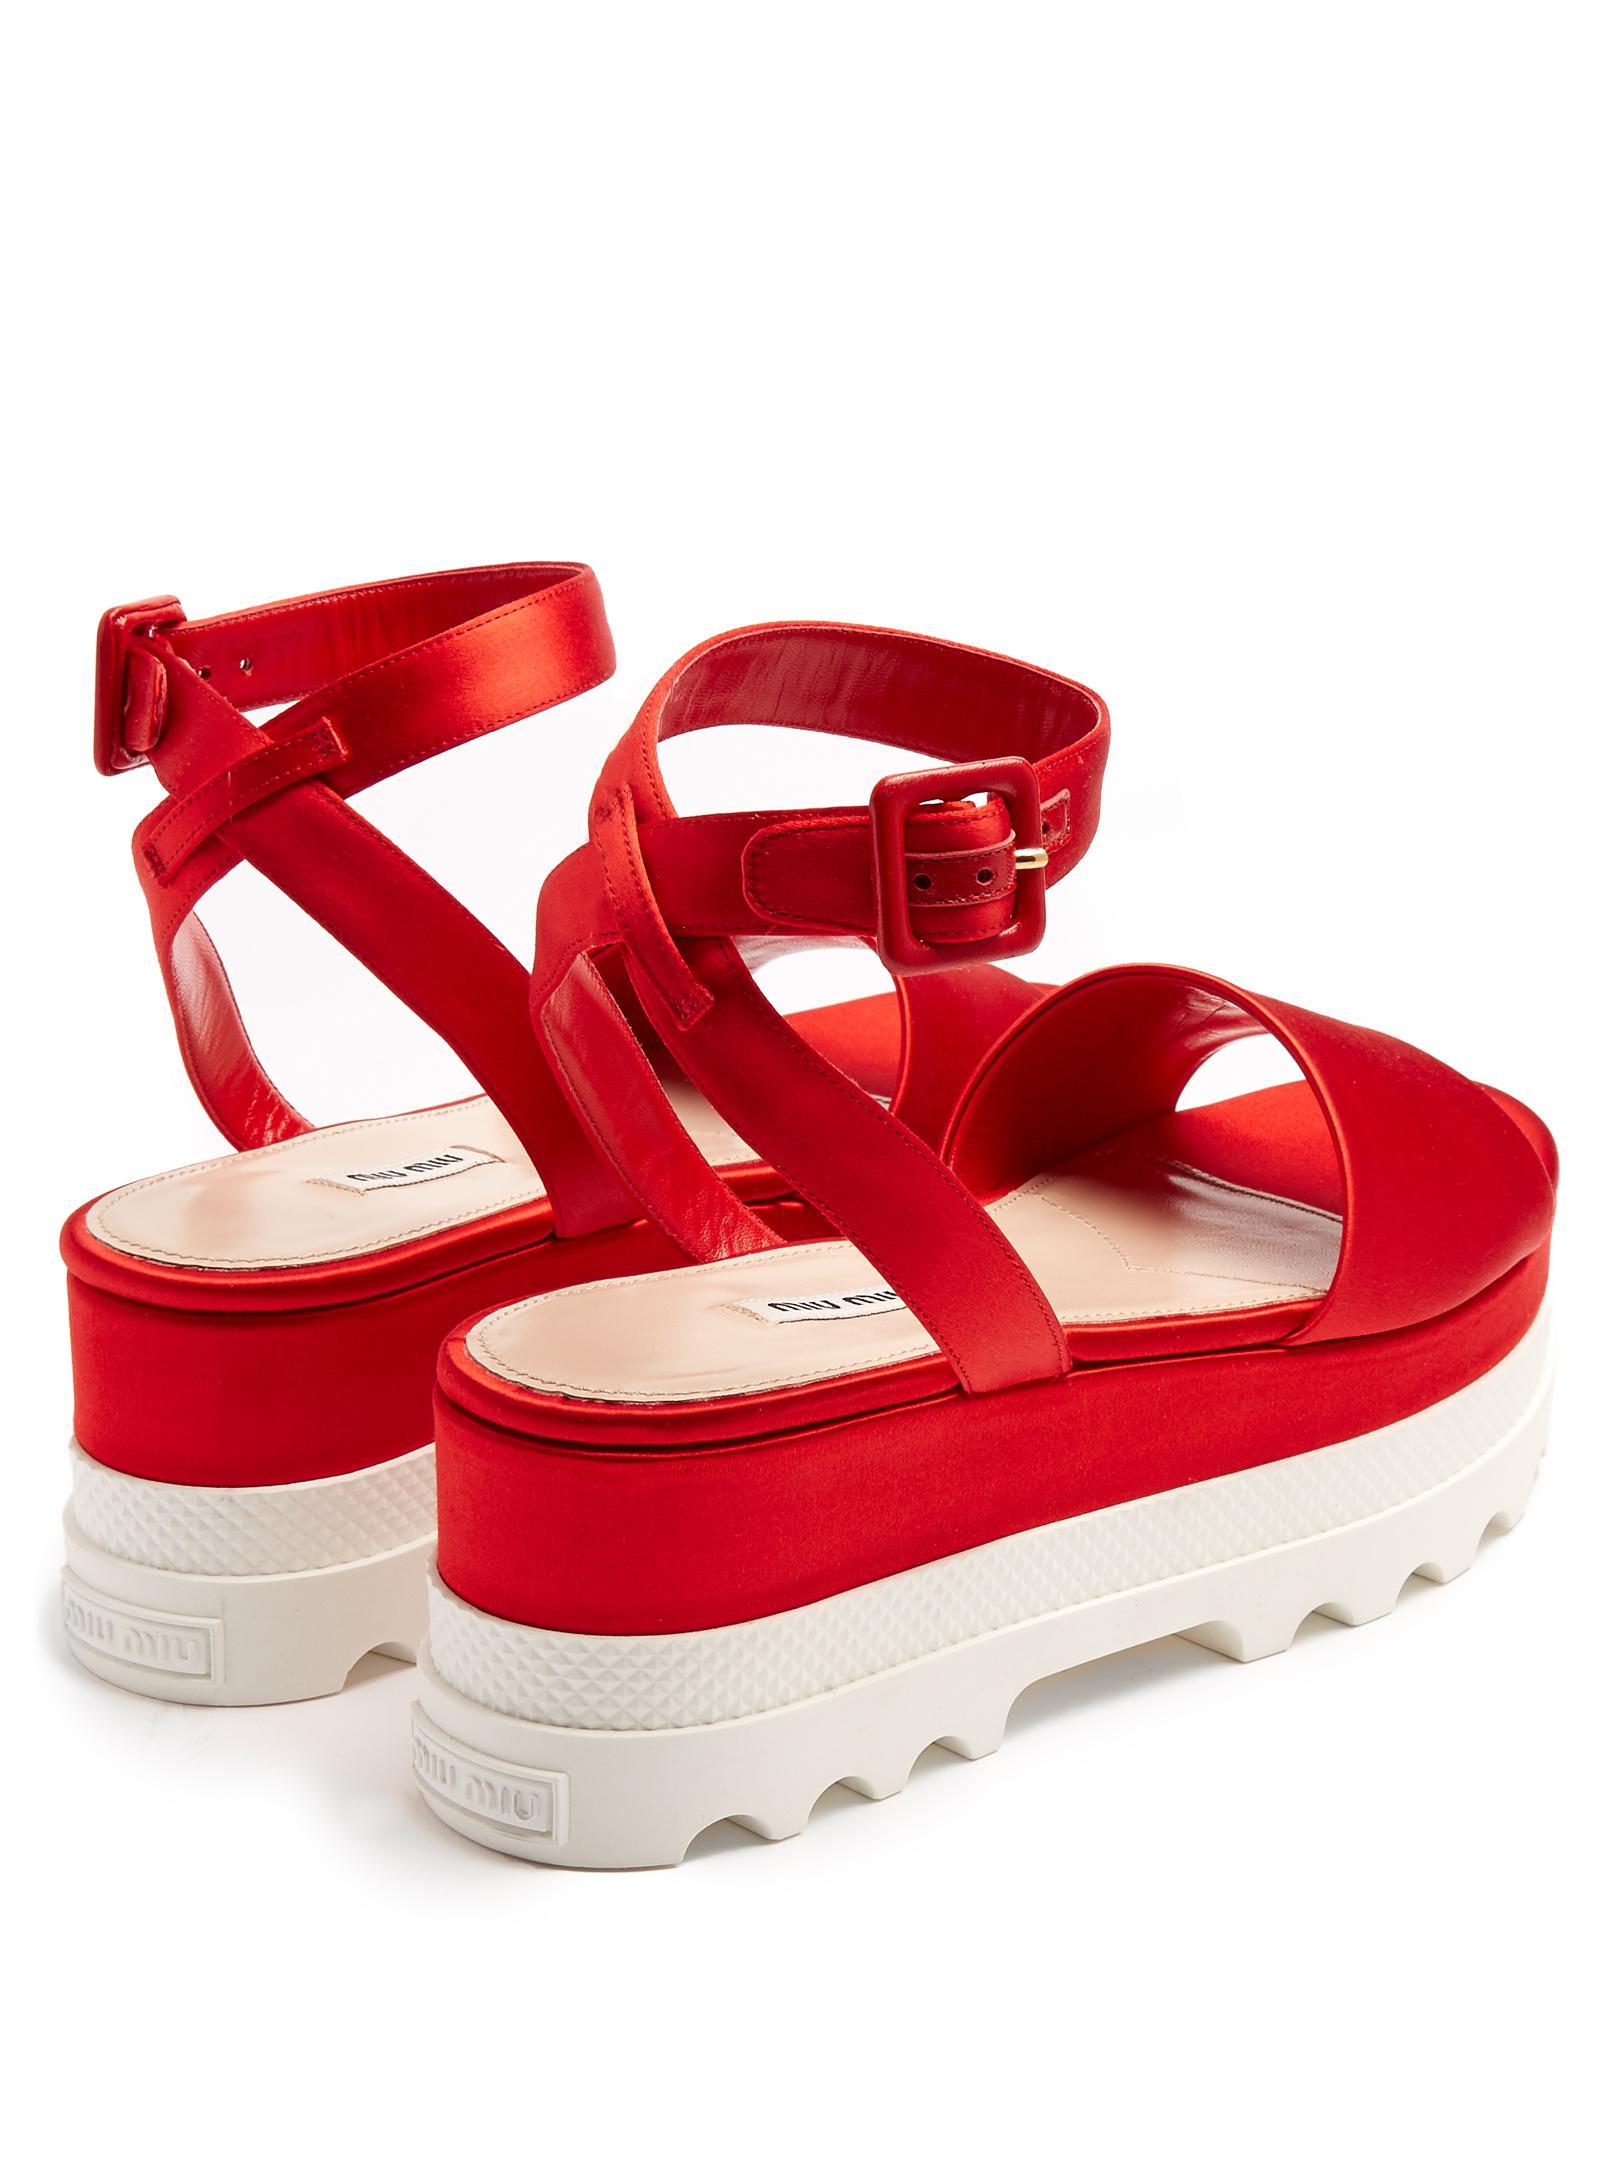 57bc2c74057d Lyst - Miu Miu Bi-colour Satin Flatform Sandal in Red